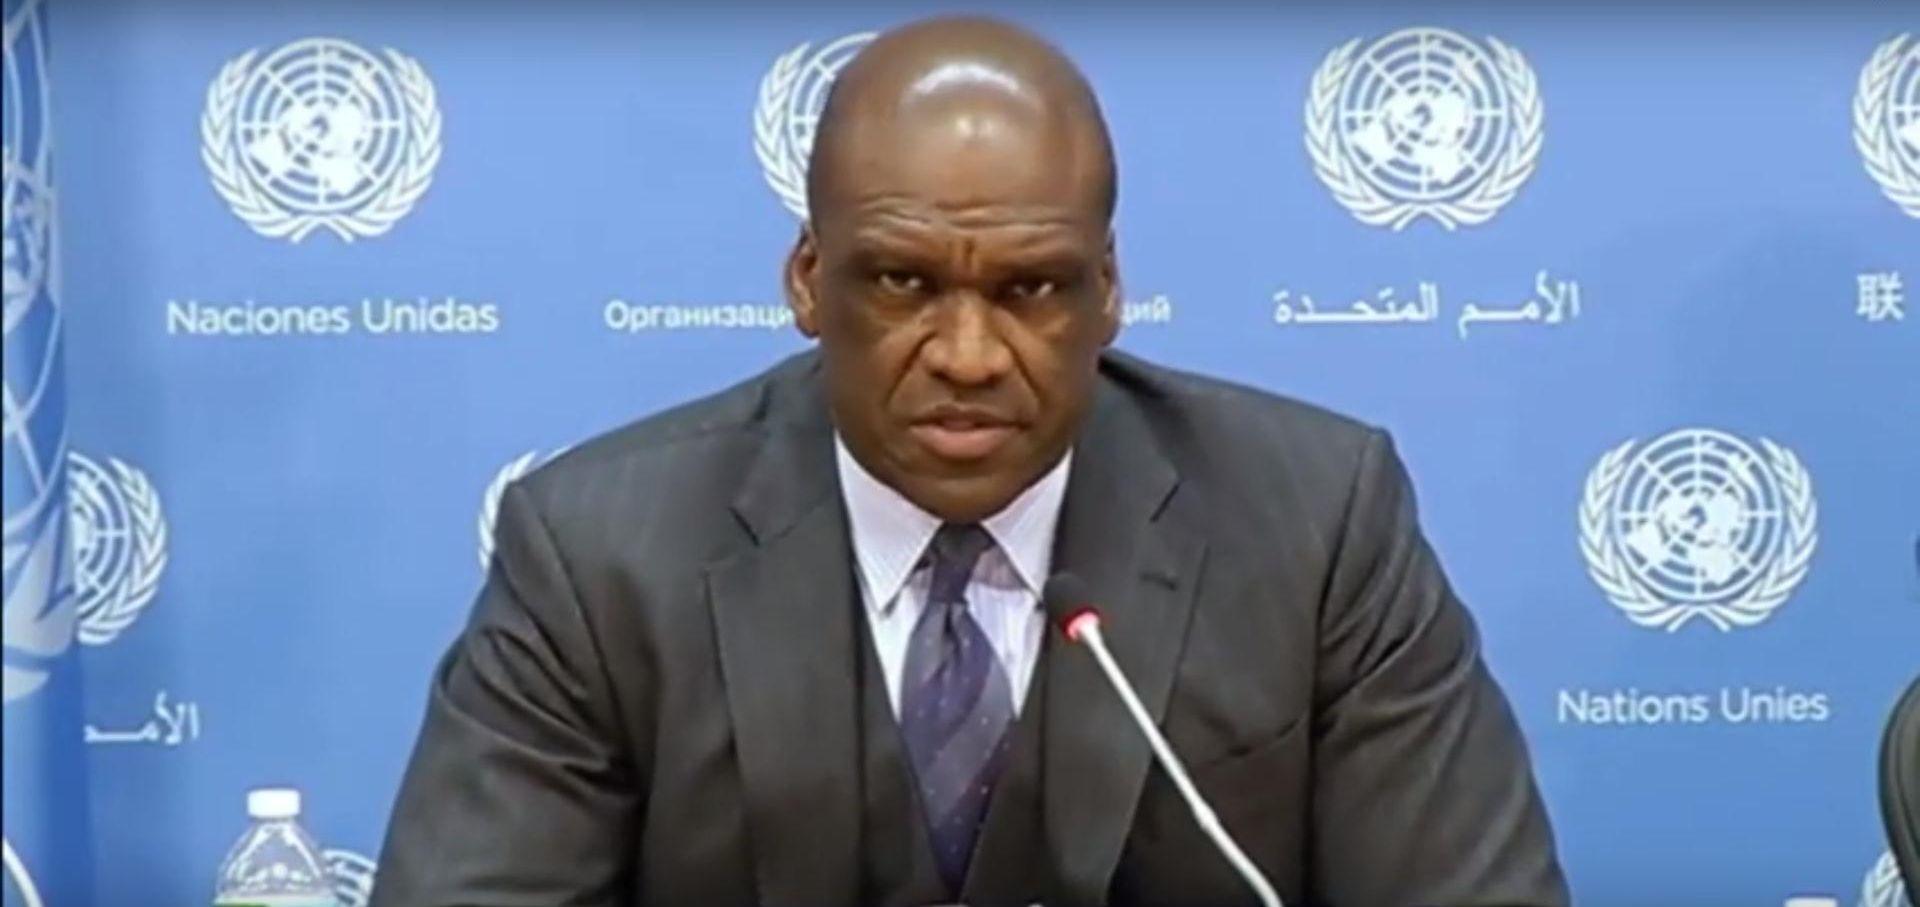 Uhićen bivši predsjednik UN-a John Ashe: Primio 1,3 milijuna dolara mita